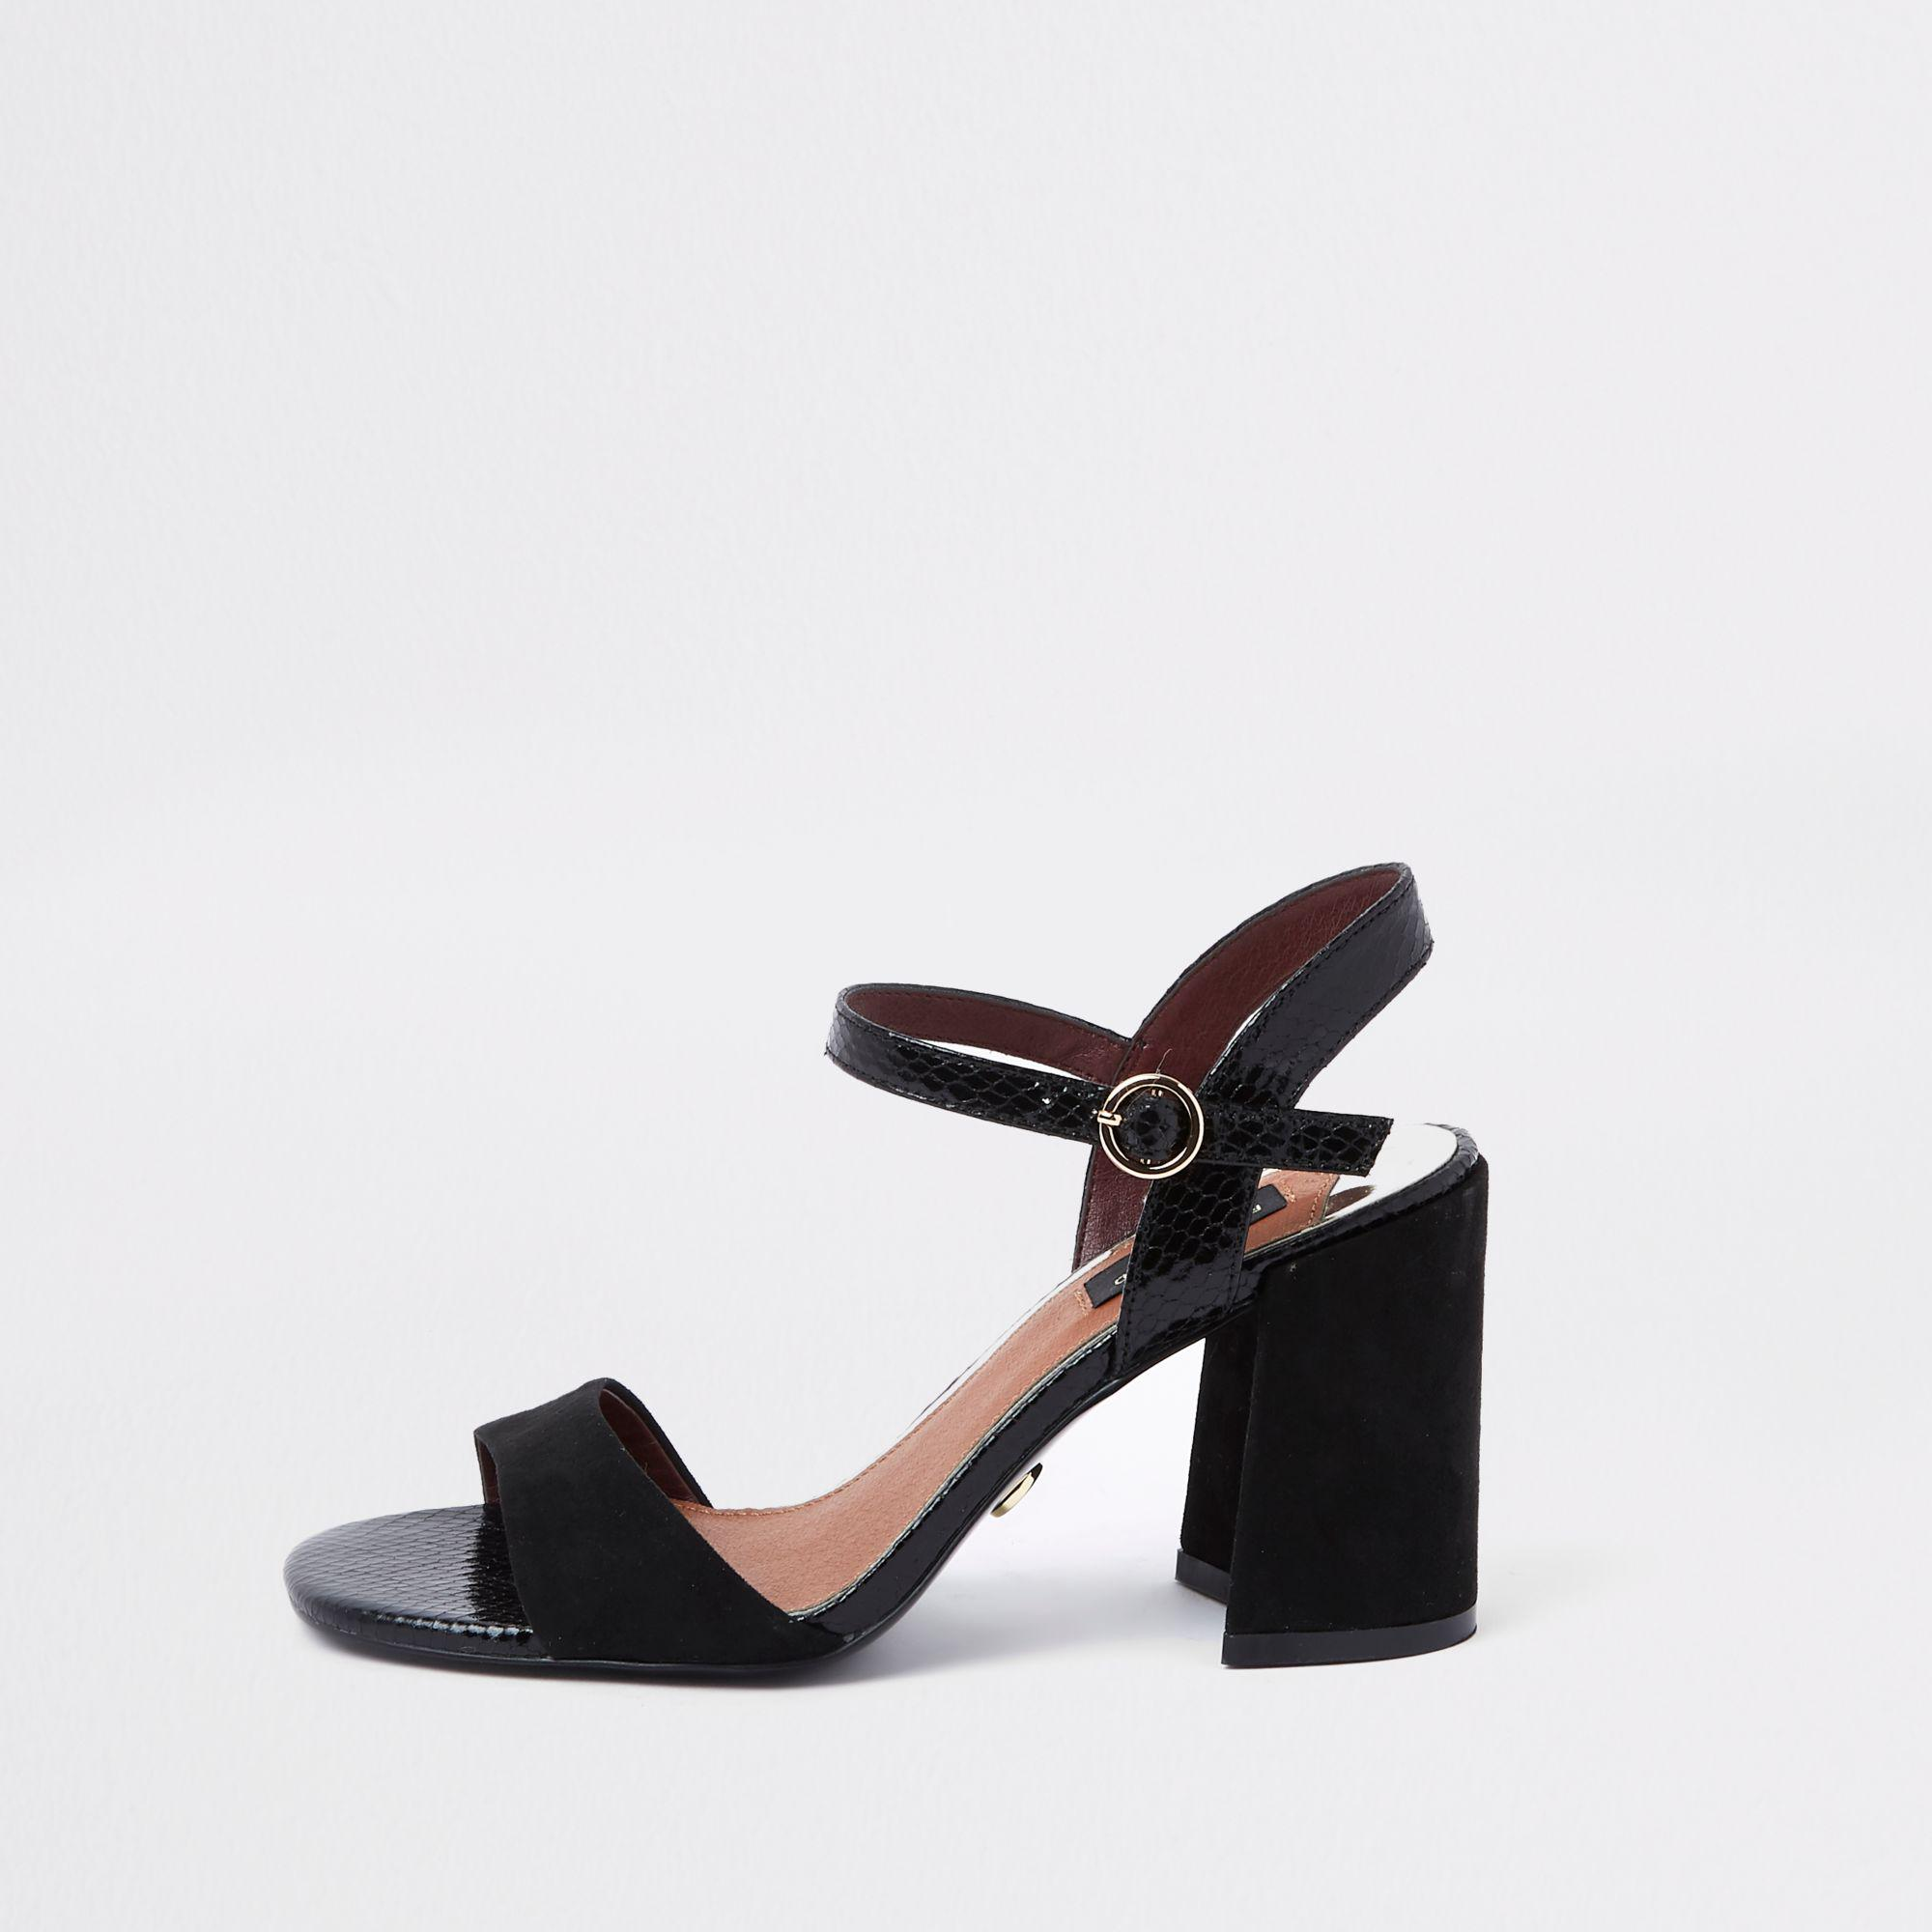 6a17f21aa97 River Island Croc Wide Fit Block Heel Sandals in Black - Lyst